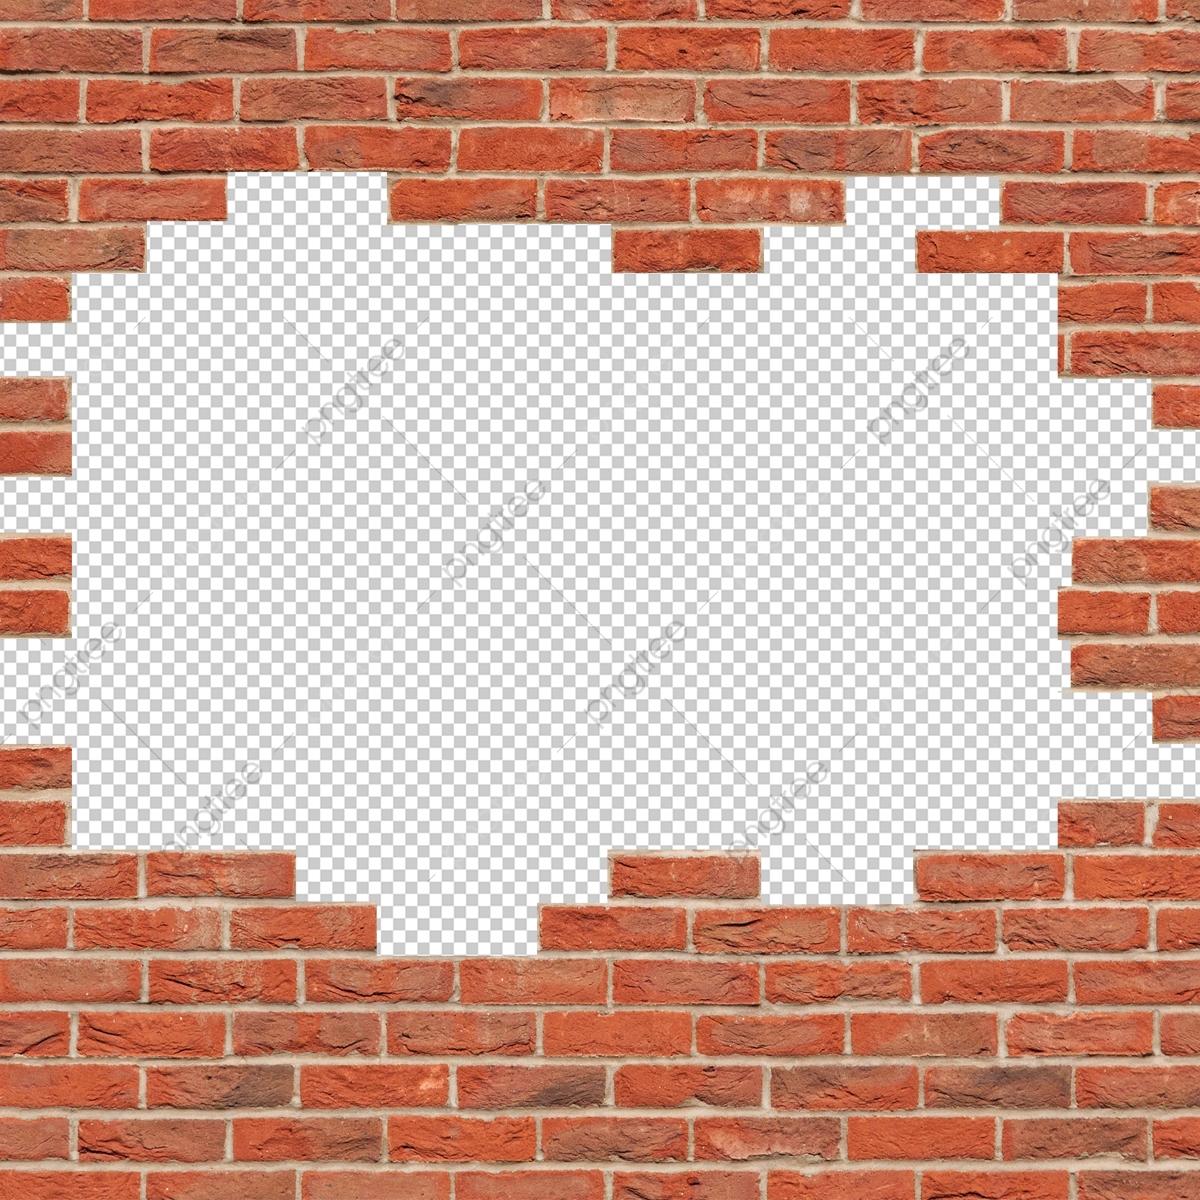 Broken Wall Brick, Wall, Break, Effect PNG Transparent Clipart Image.